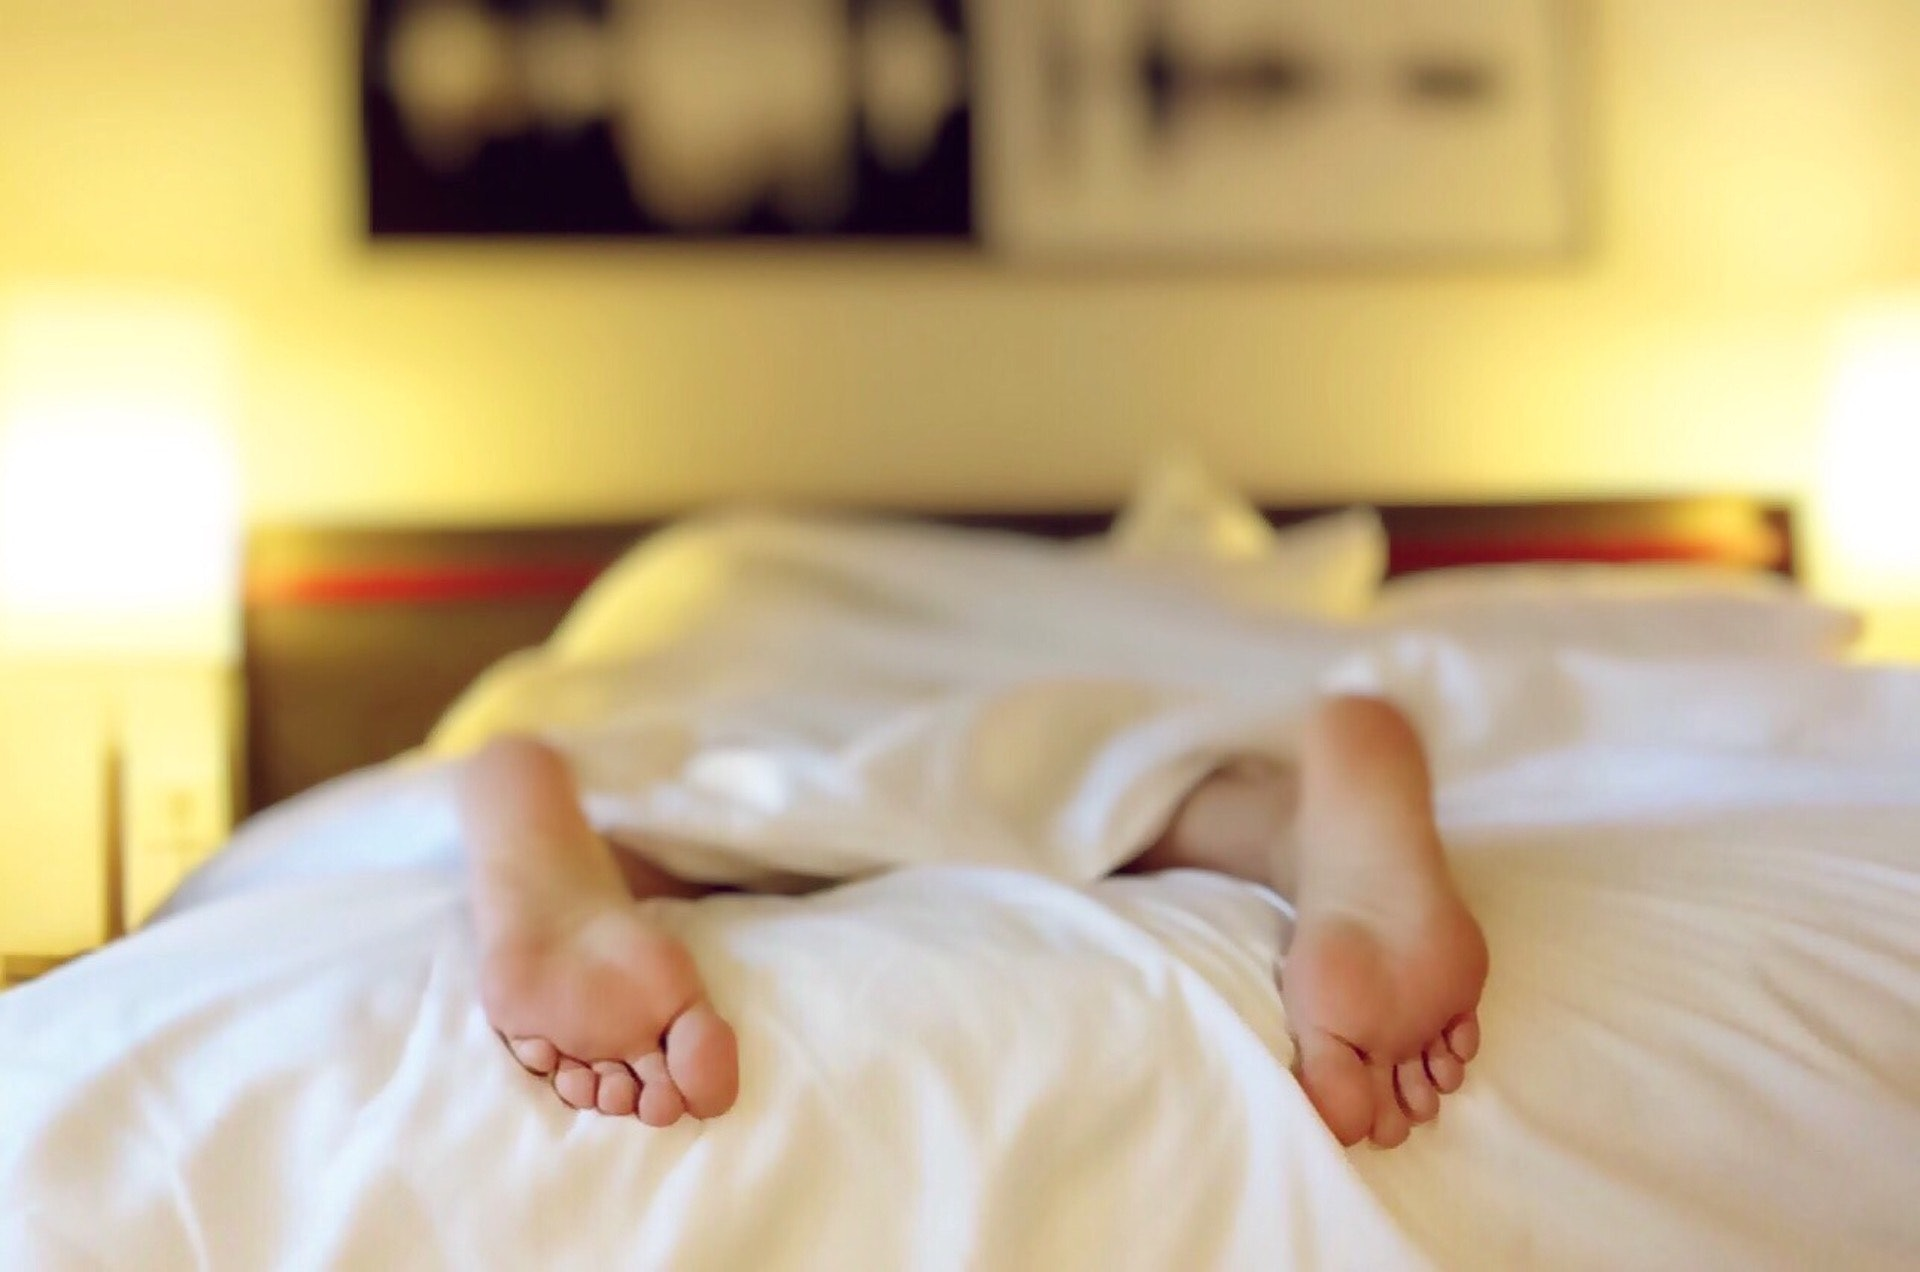 Paroxetine decreased sex drive